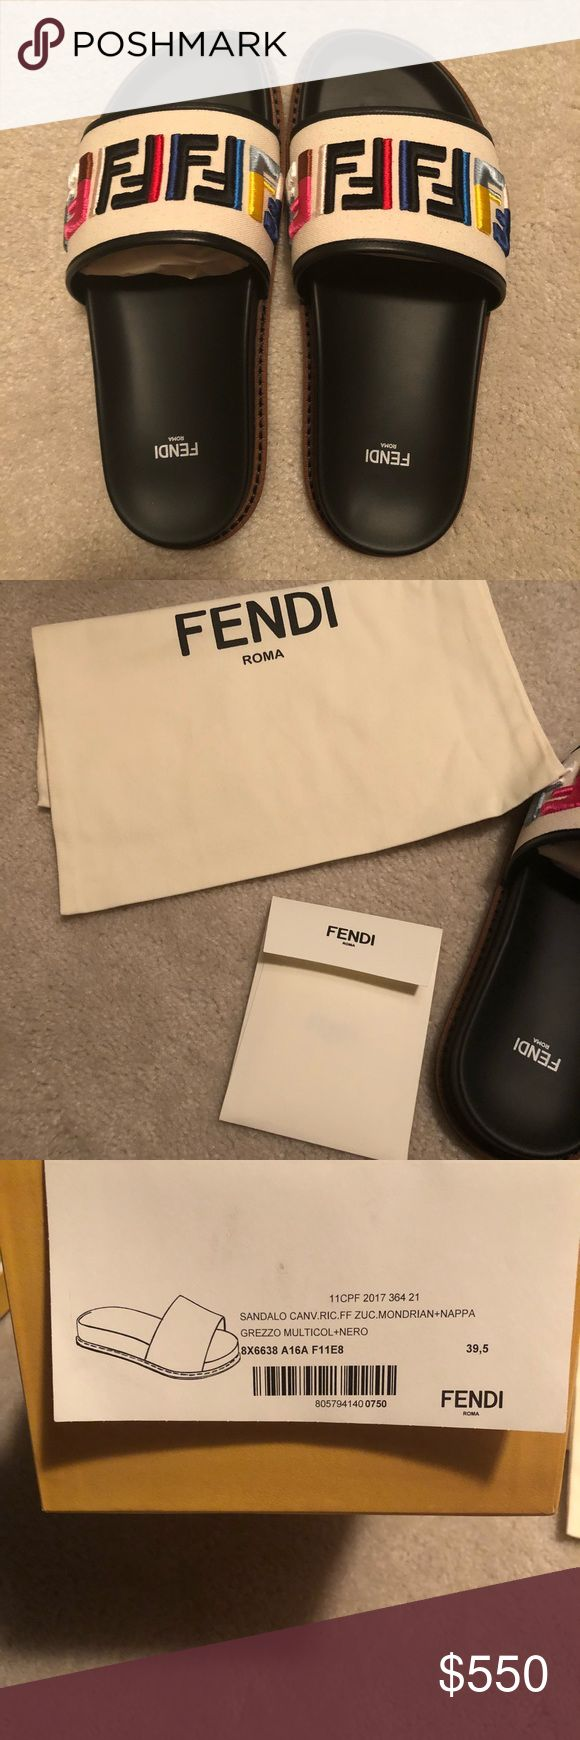 51 best fendi images on Pinterest   Satchel handbags, Wallets and